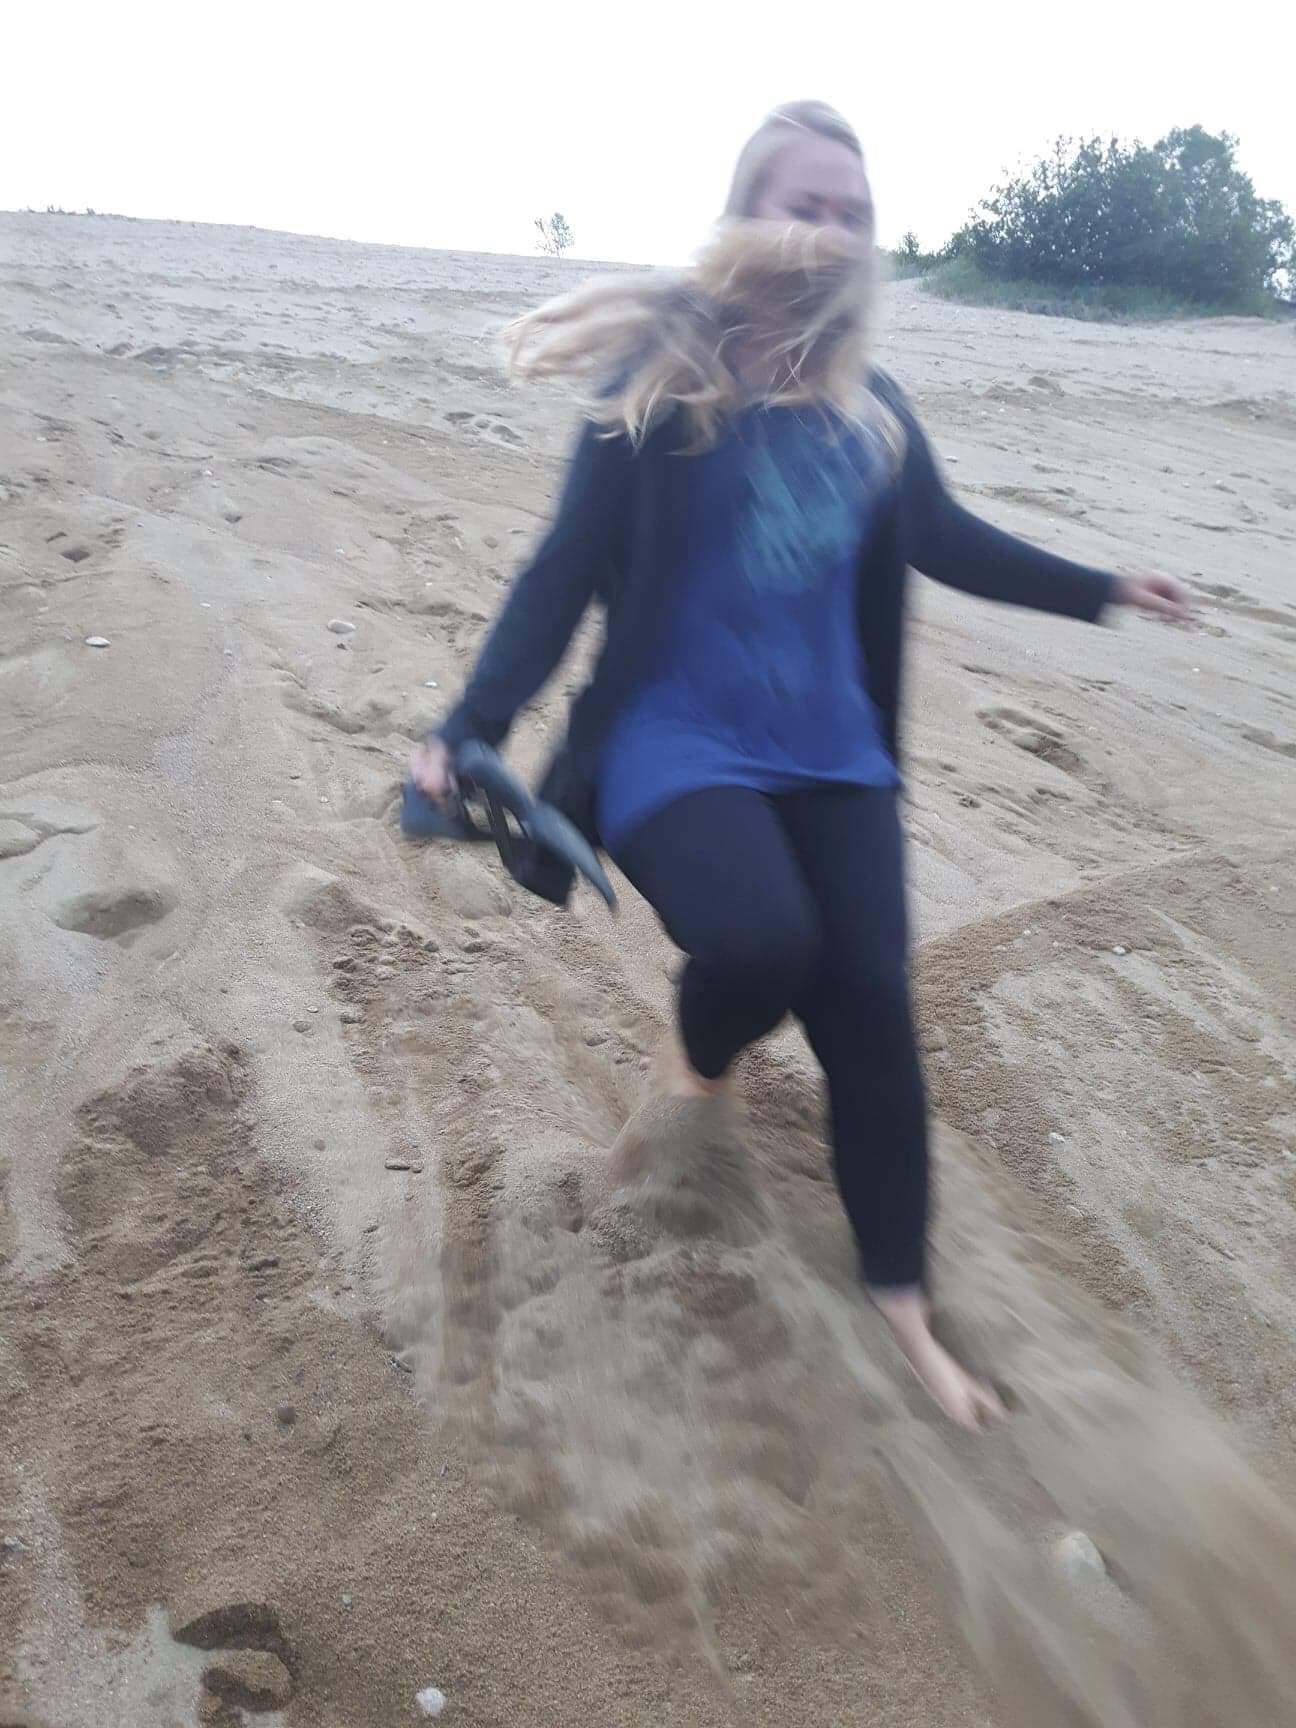 dune-tadoussac-quebec-andreanne-pinard-1